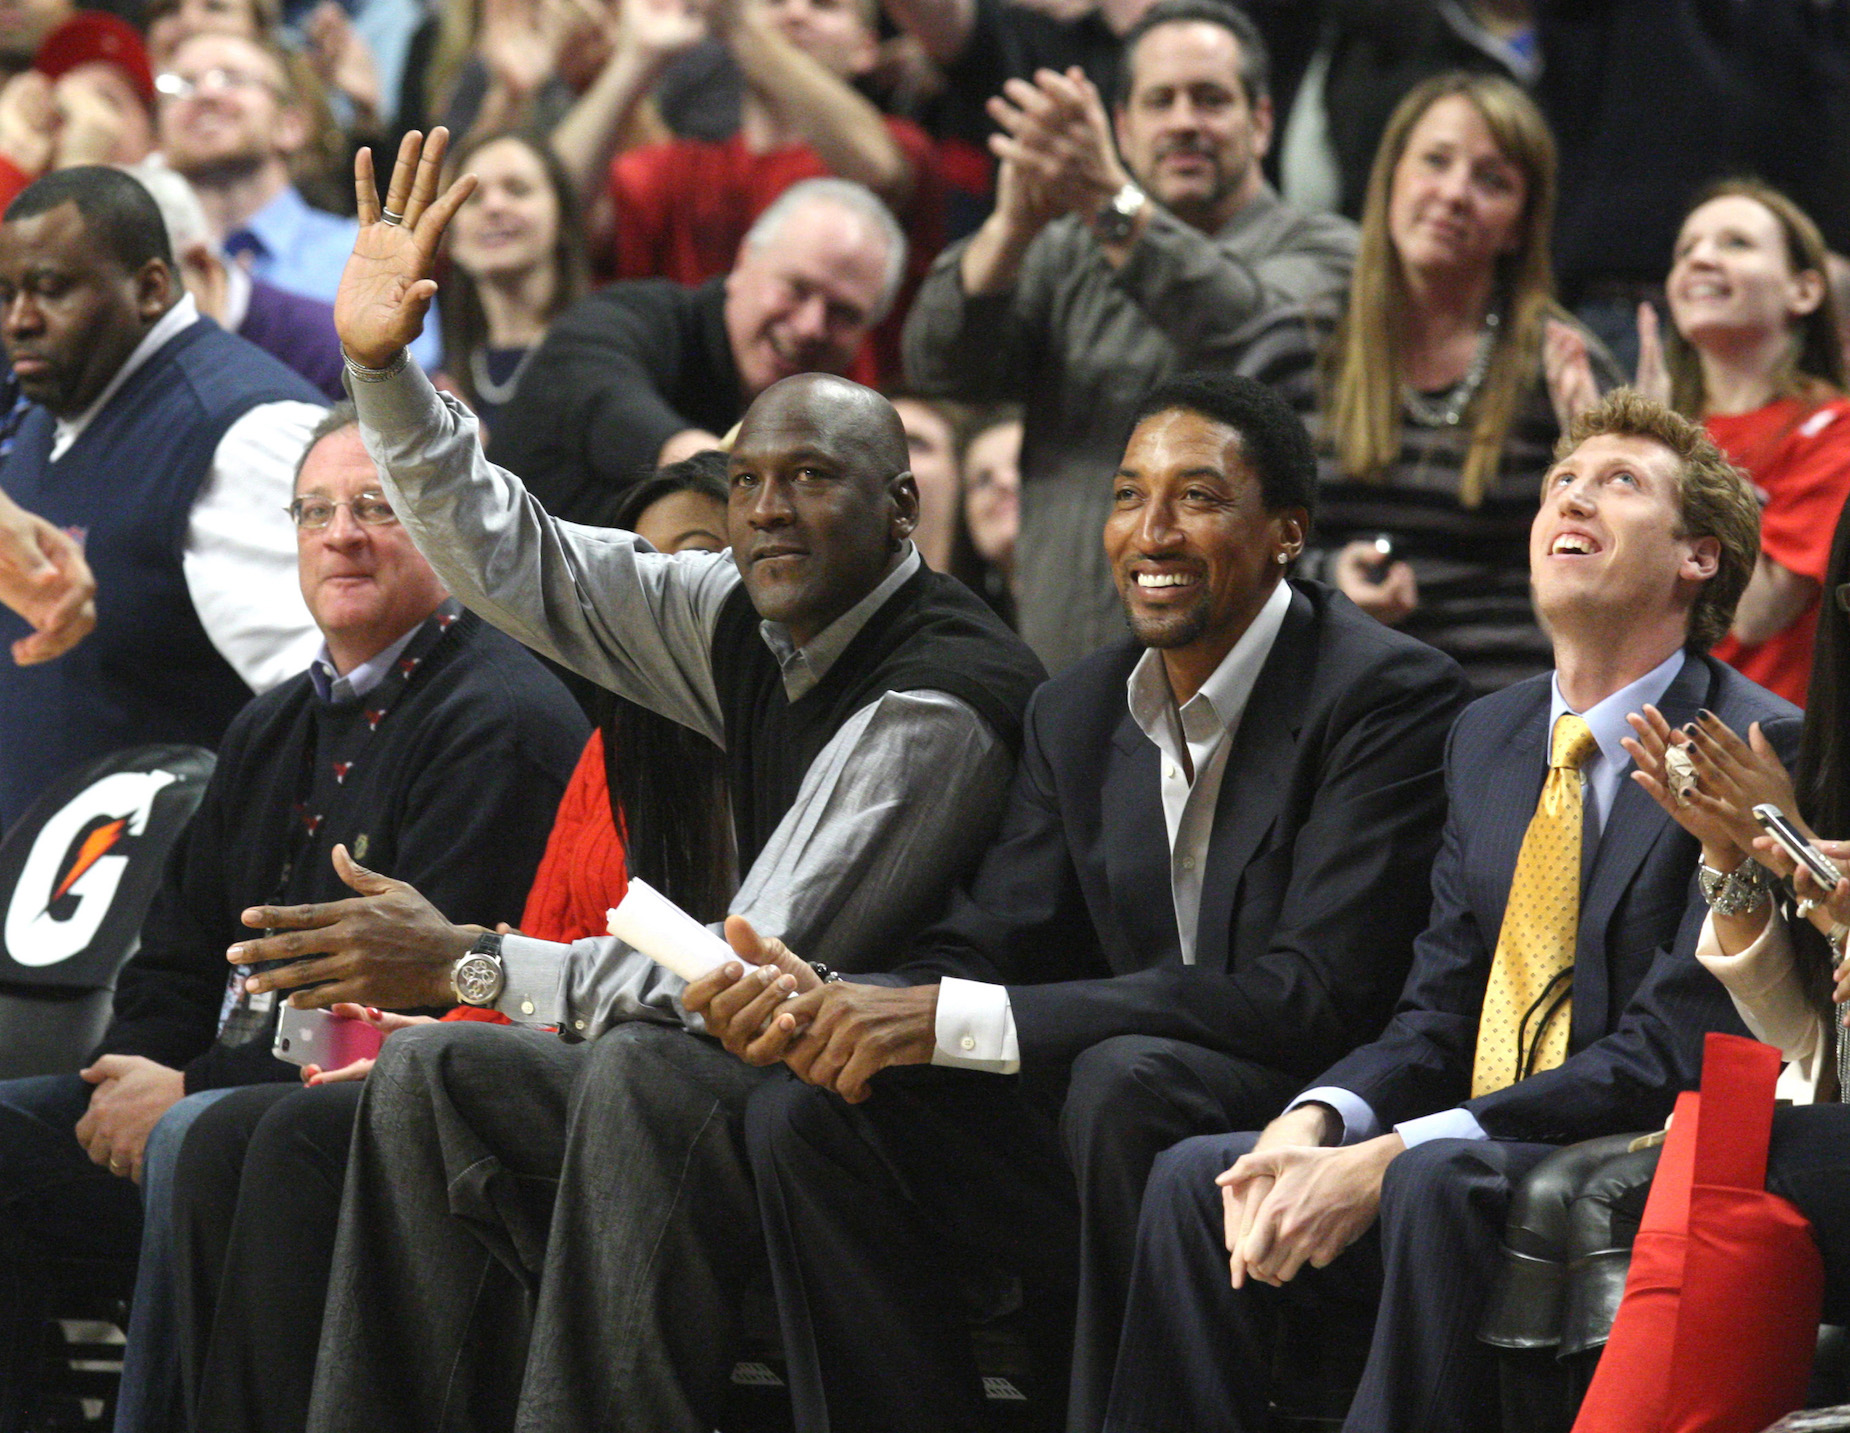 Michael Jordan and Scottie Pippen Are Still Commanding Top Dollar, Even in Retirement